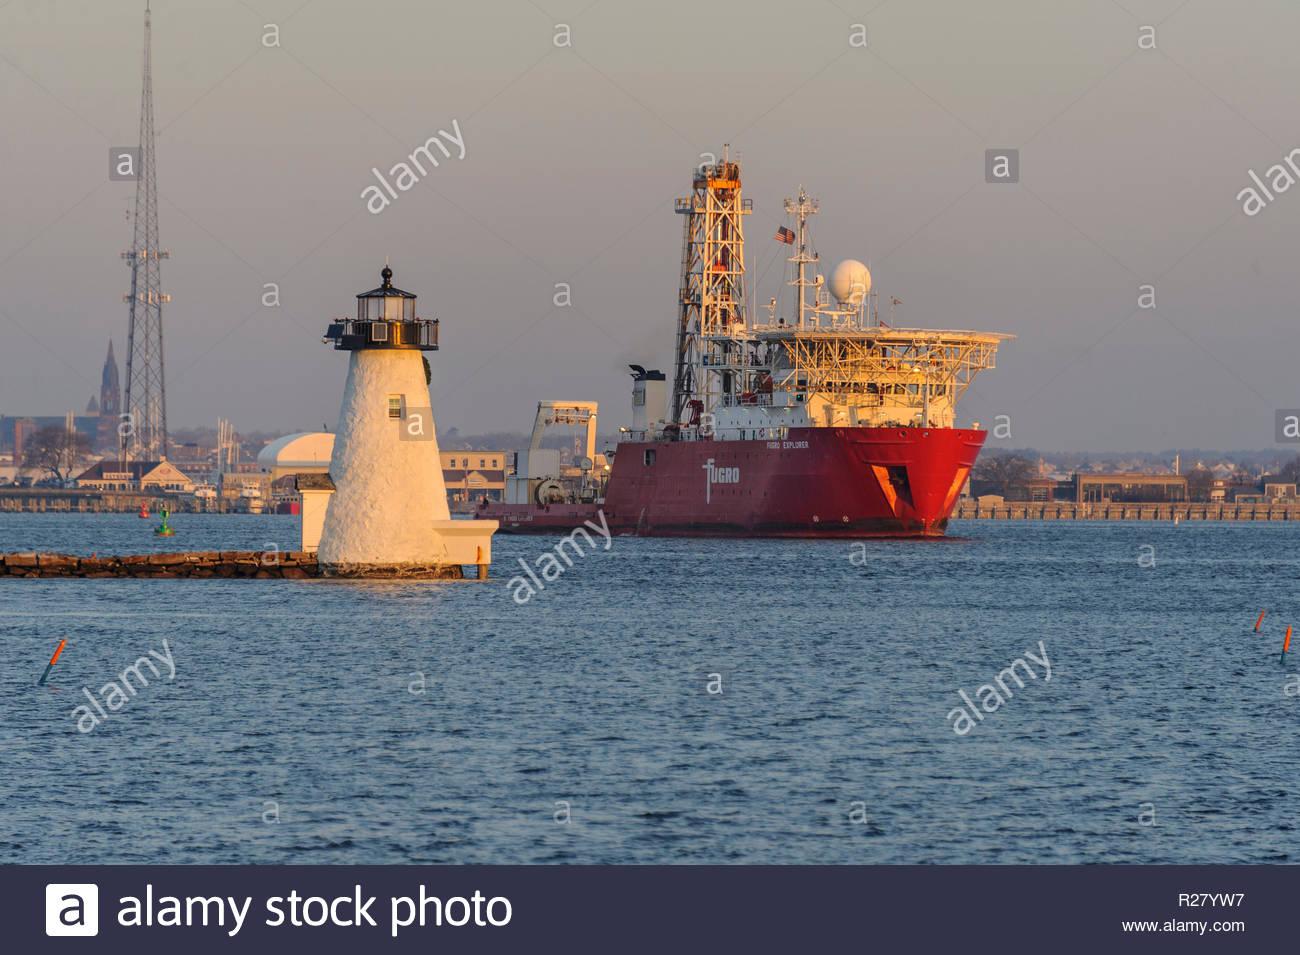 New Bedford, Massachusetts, USA - January 19, 2018: Geotechnical drill ship Fugro Explorer passing Palmer's Island lighthouse during early morning dep - Stock Image